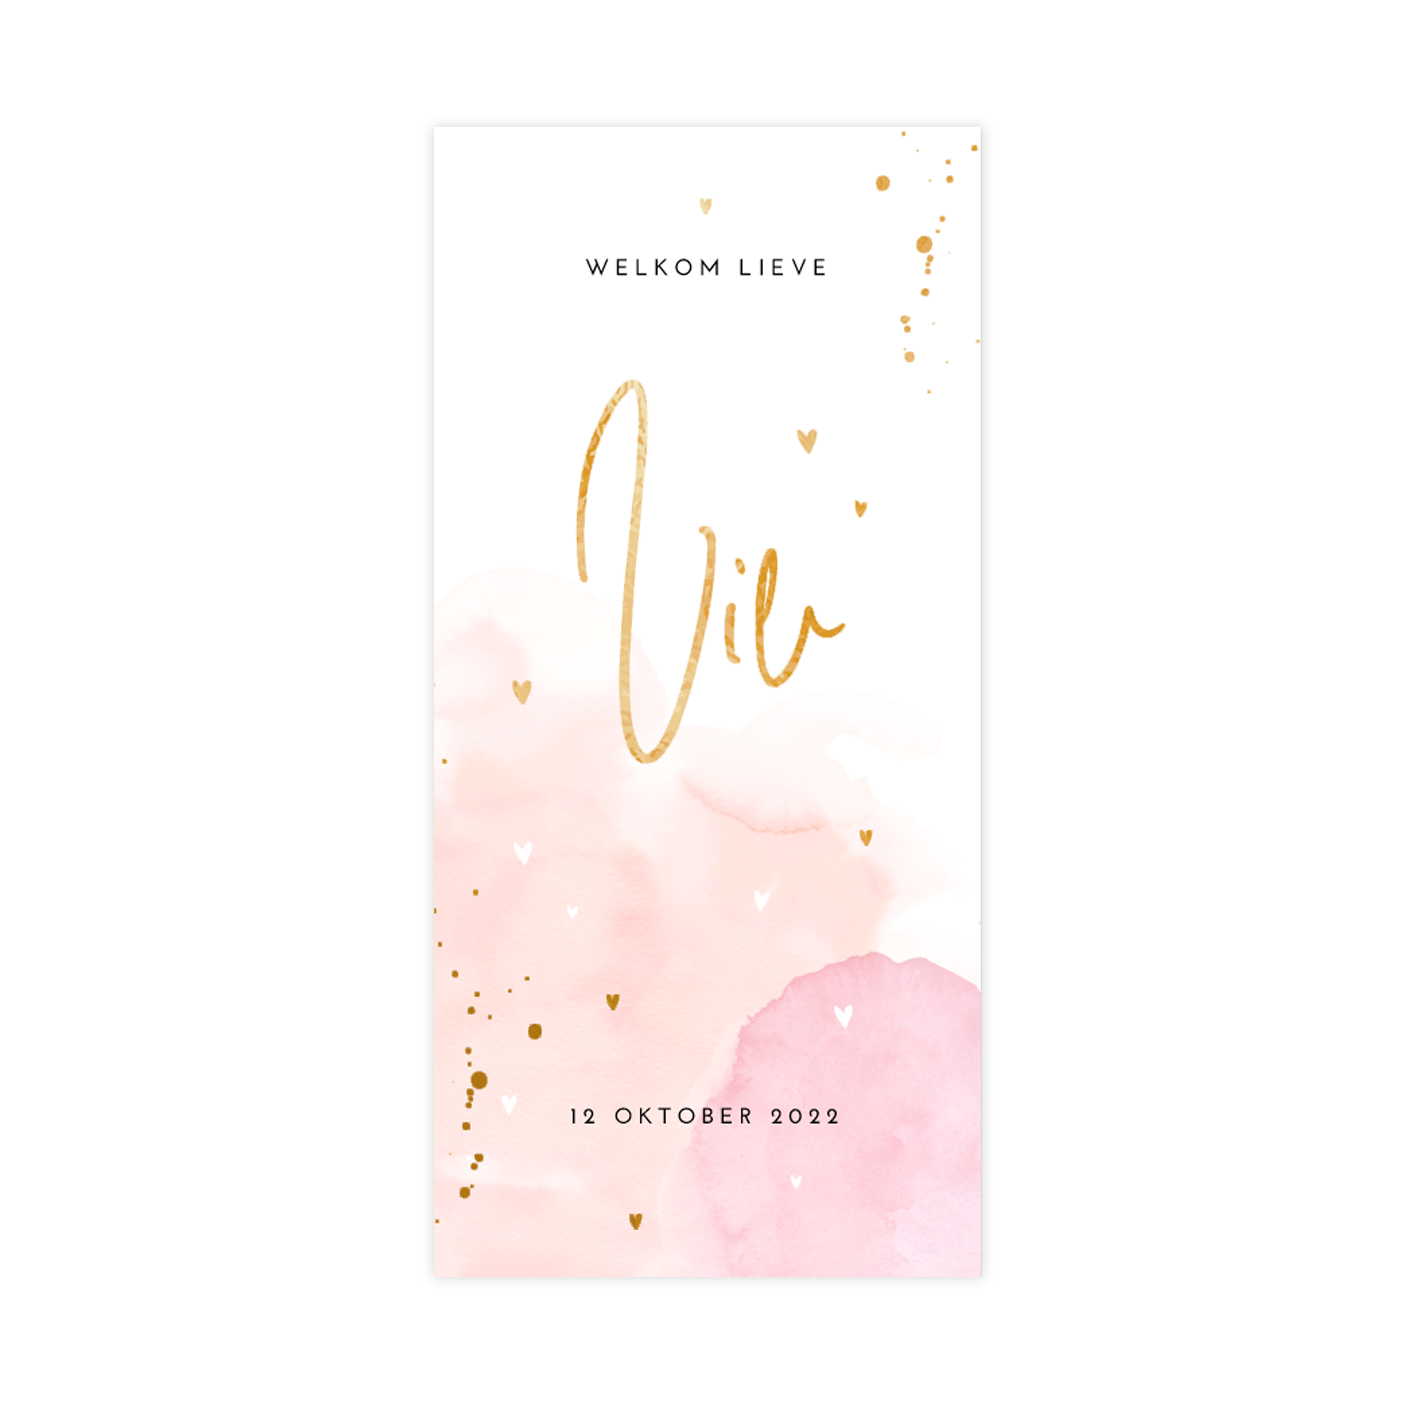 Lief goudfolie geboortekaartje voor meisje met watercolour peach